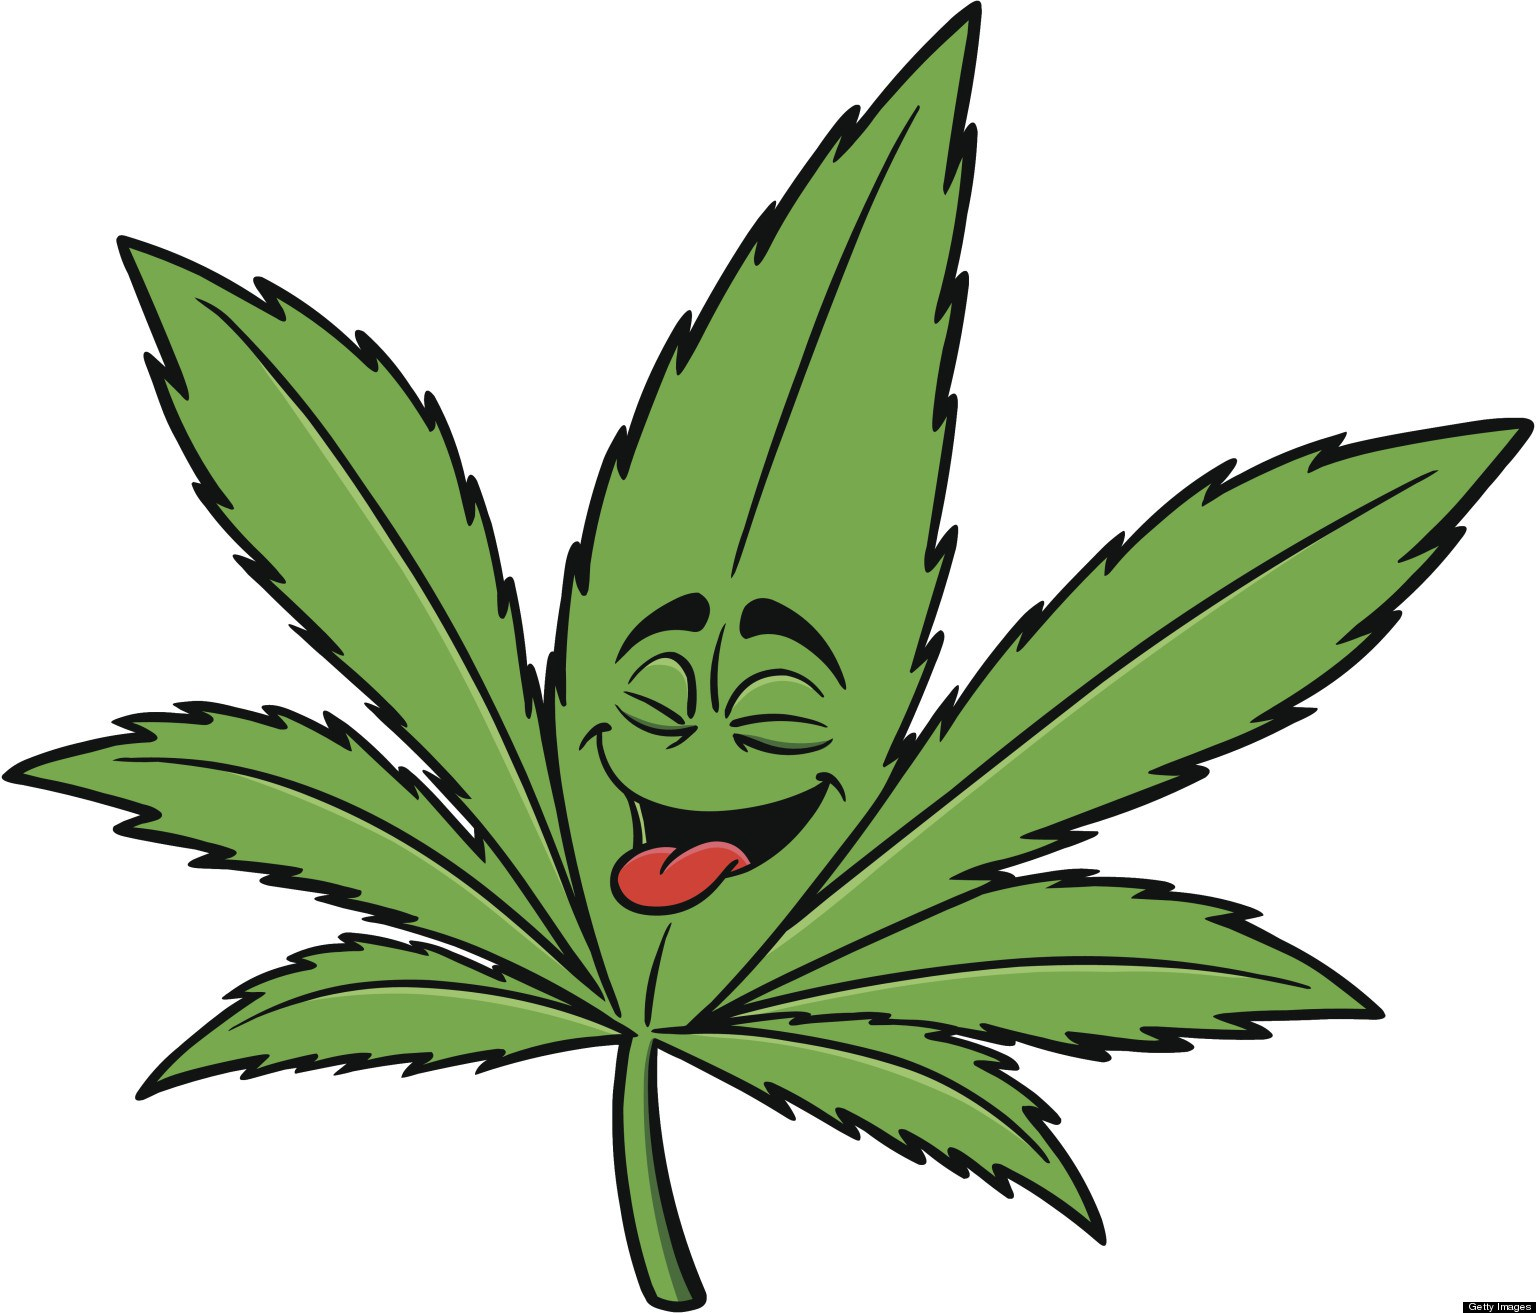 Marijuana Leaf Outline - ClipArt Best